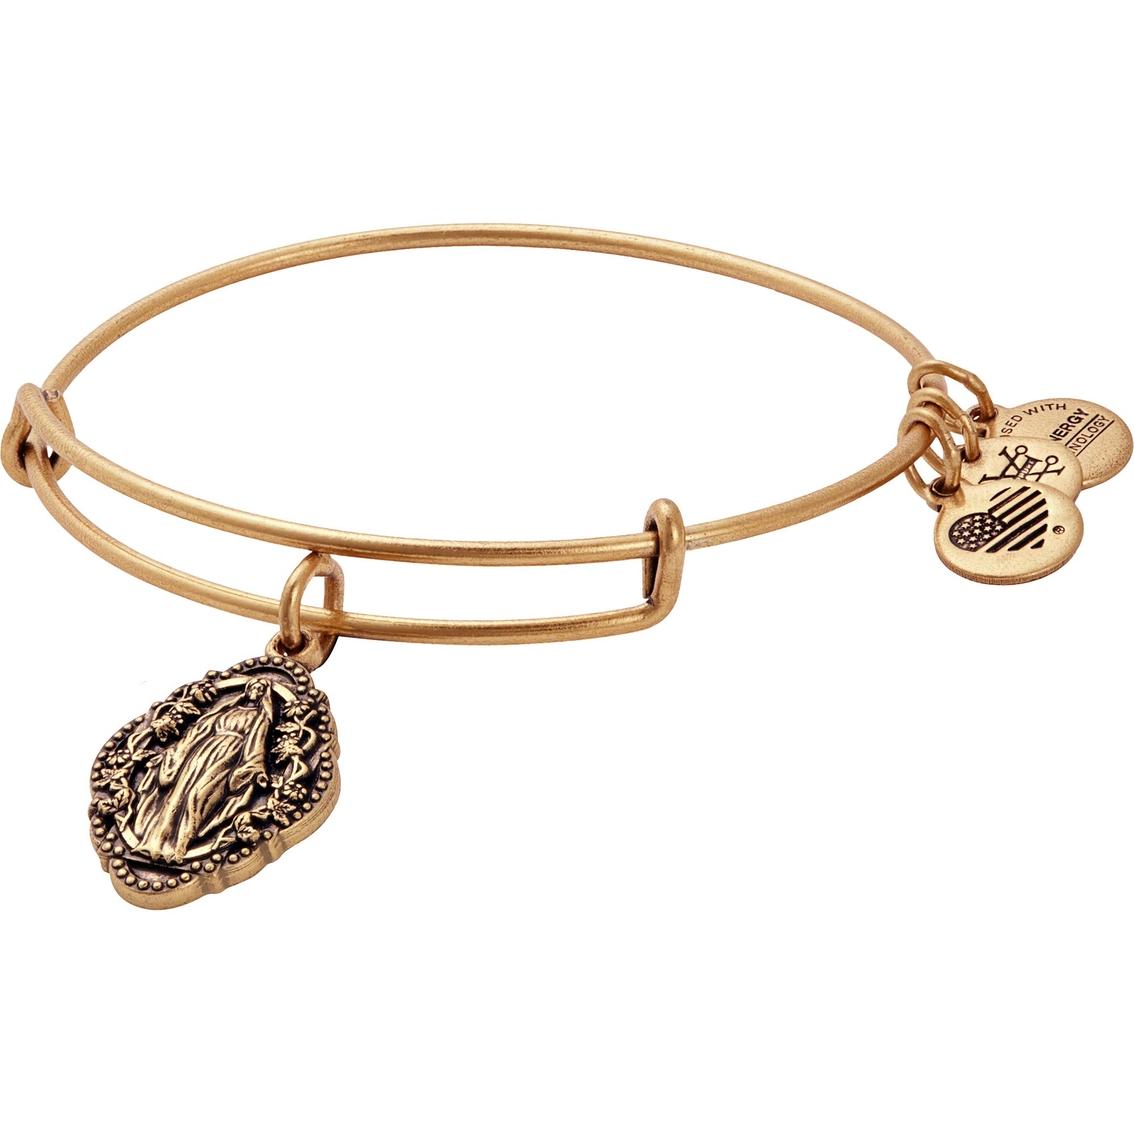 Alex And Ani Mother Mary Charm Bangle Bracelet